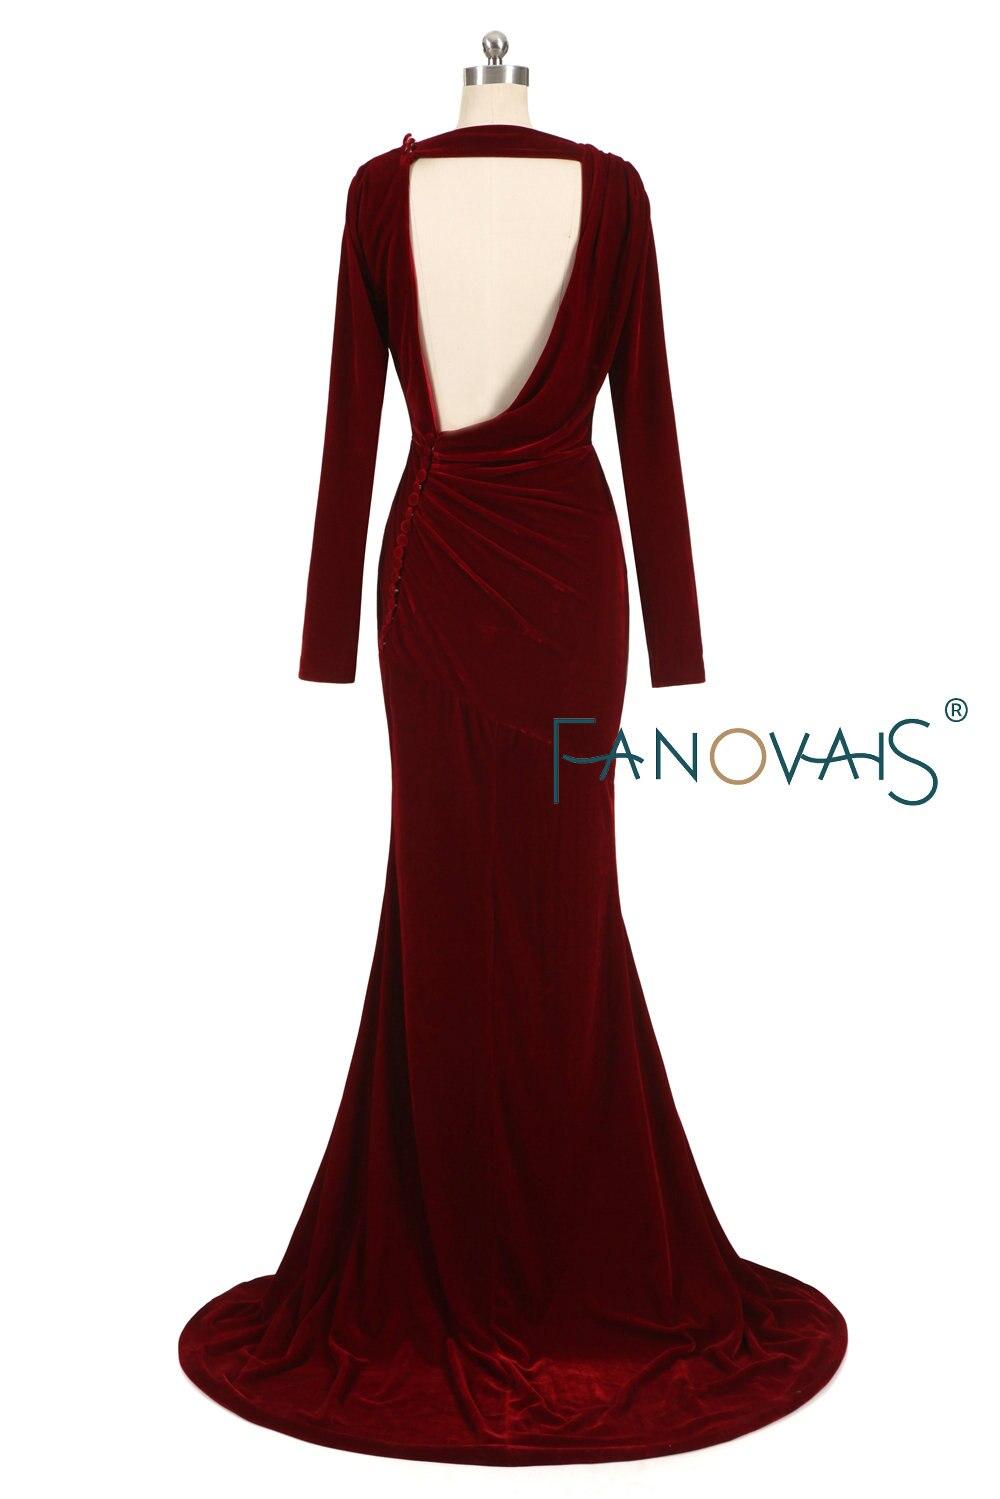 Burgundy velvet Evening Dresses Long Sleeves robe de soiree longue 2019 Prom Dress abendkleider vestidos de fiesta de noche in Evening Dresses from Weddings Events